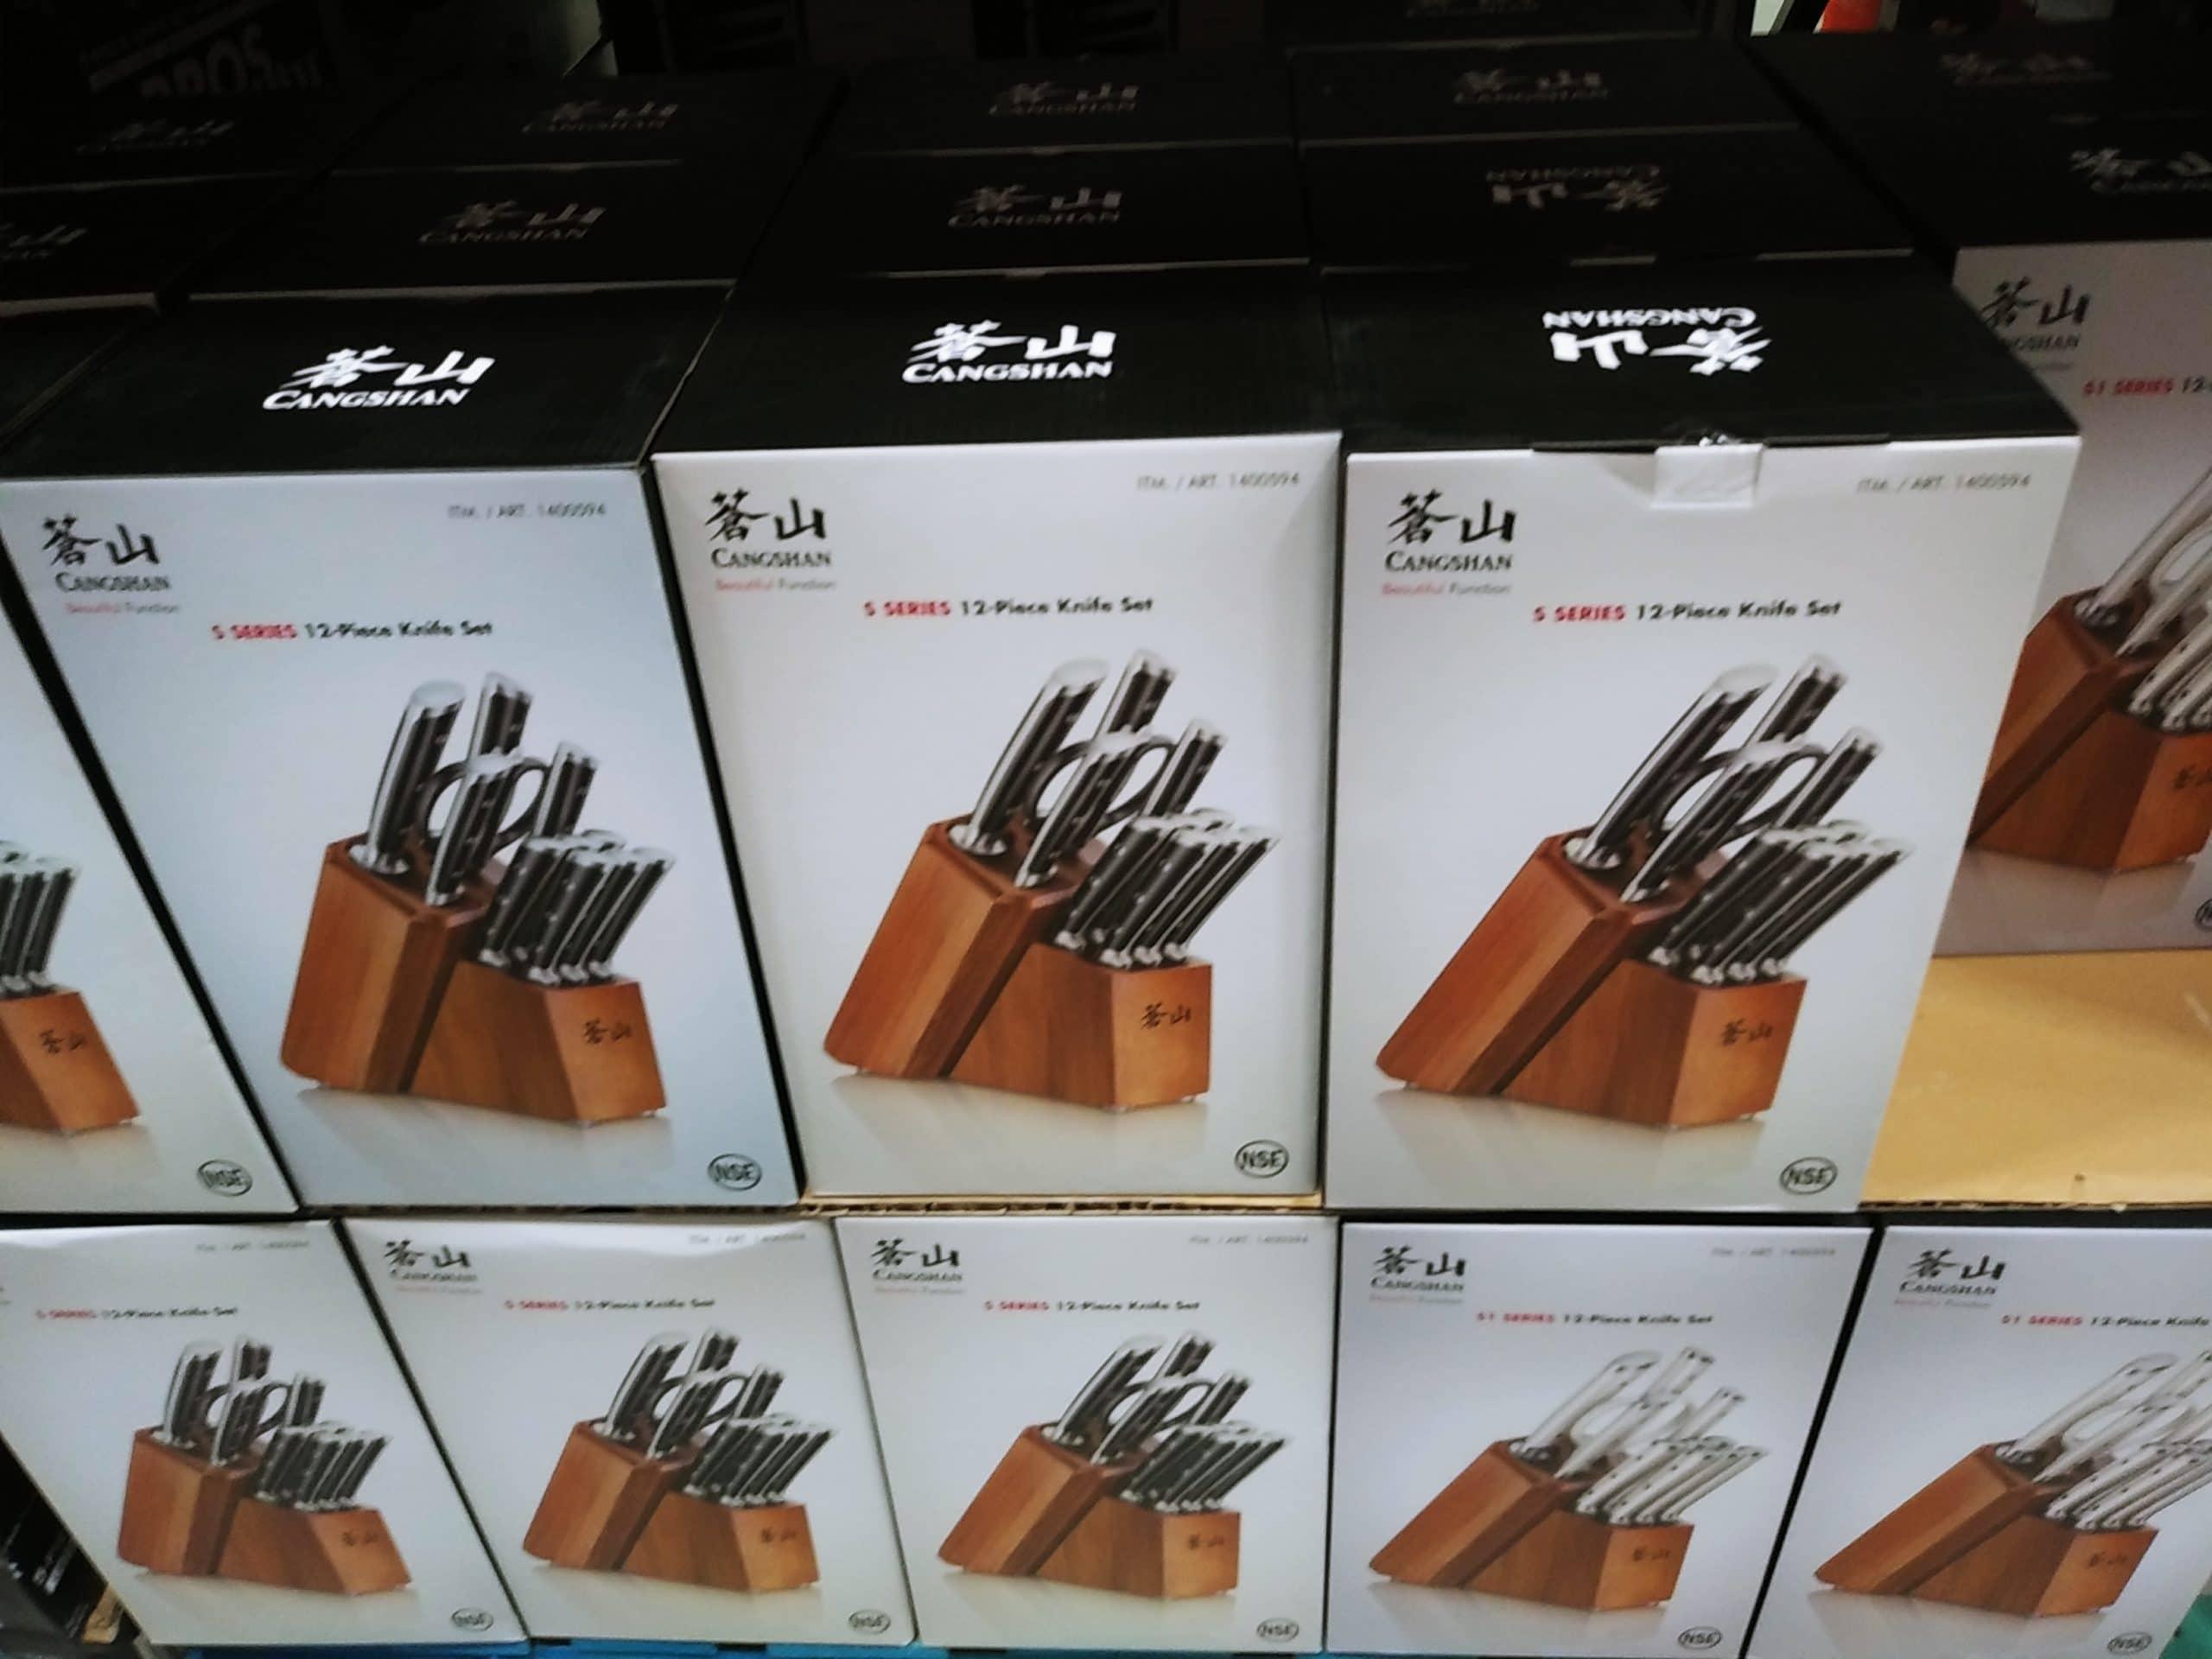 Cangshan 12pc Knife Set $99.99